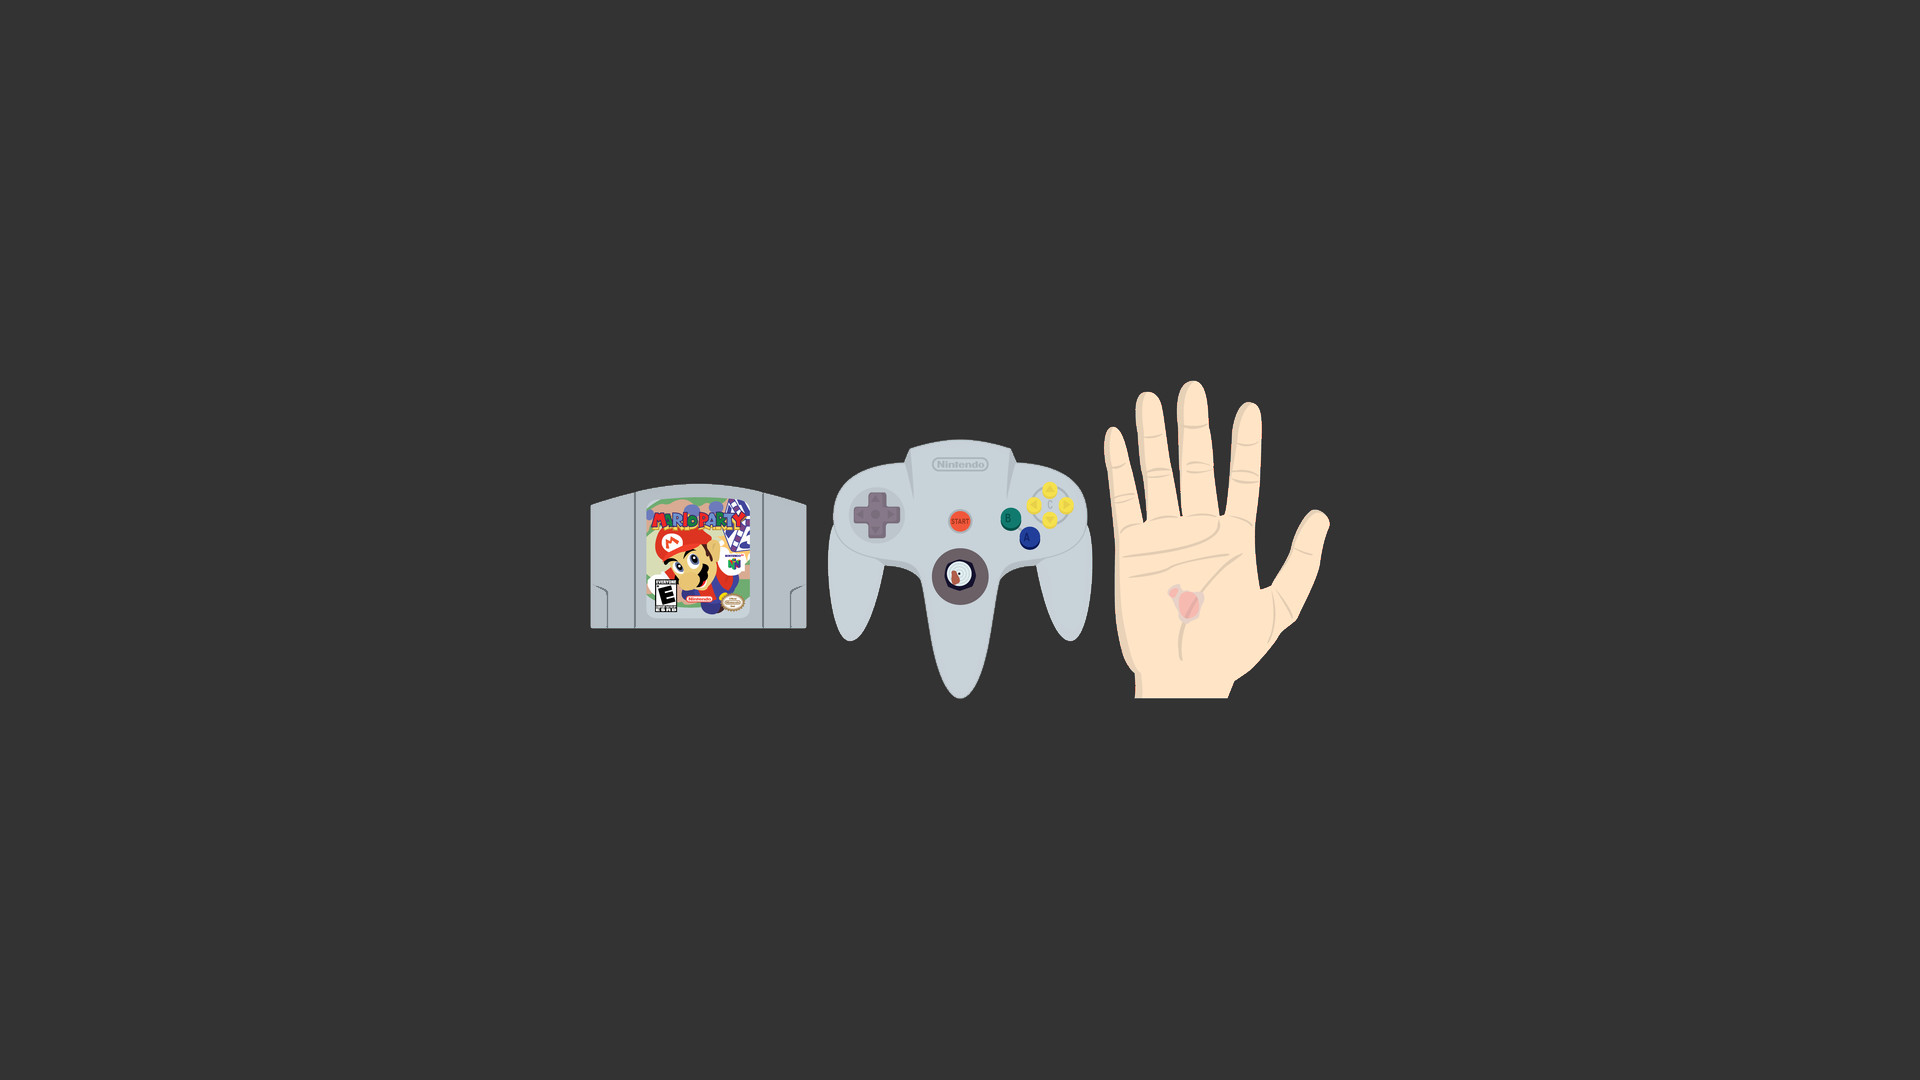 N64 Logo Wallpaper Nintendo 64 wallpapers and